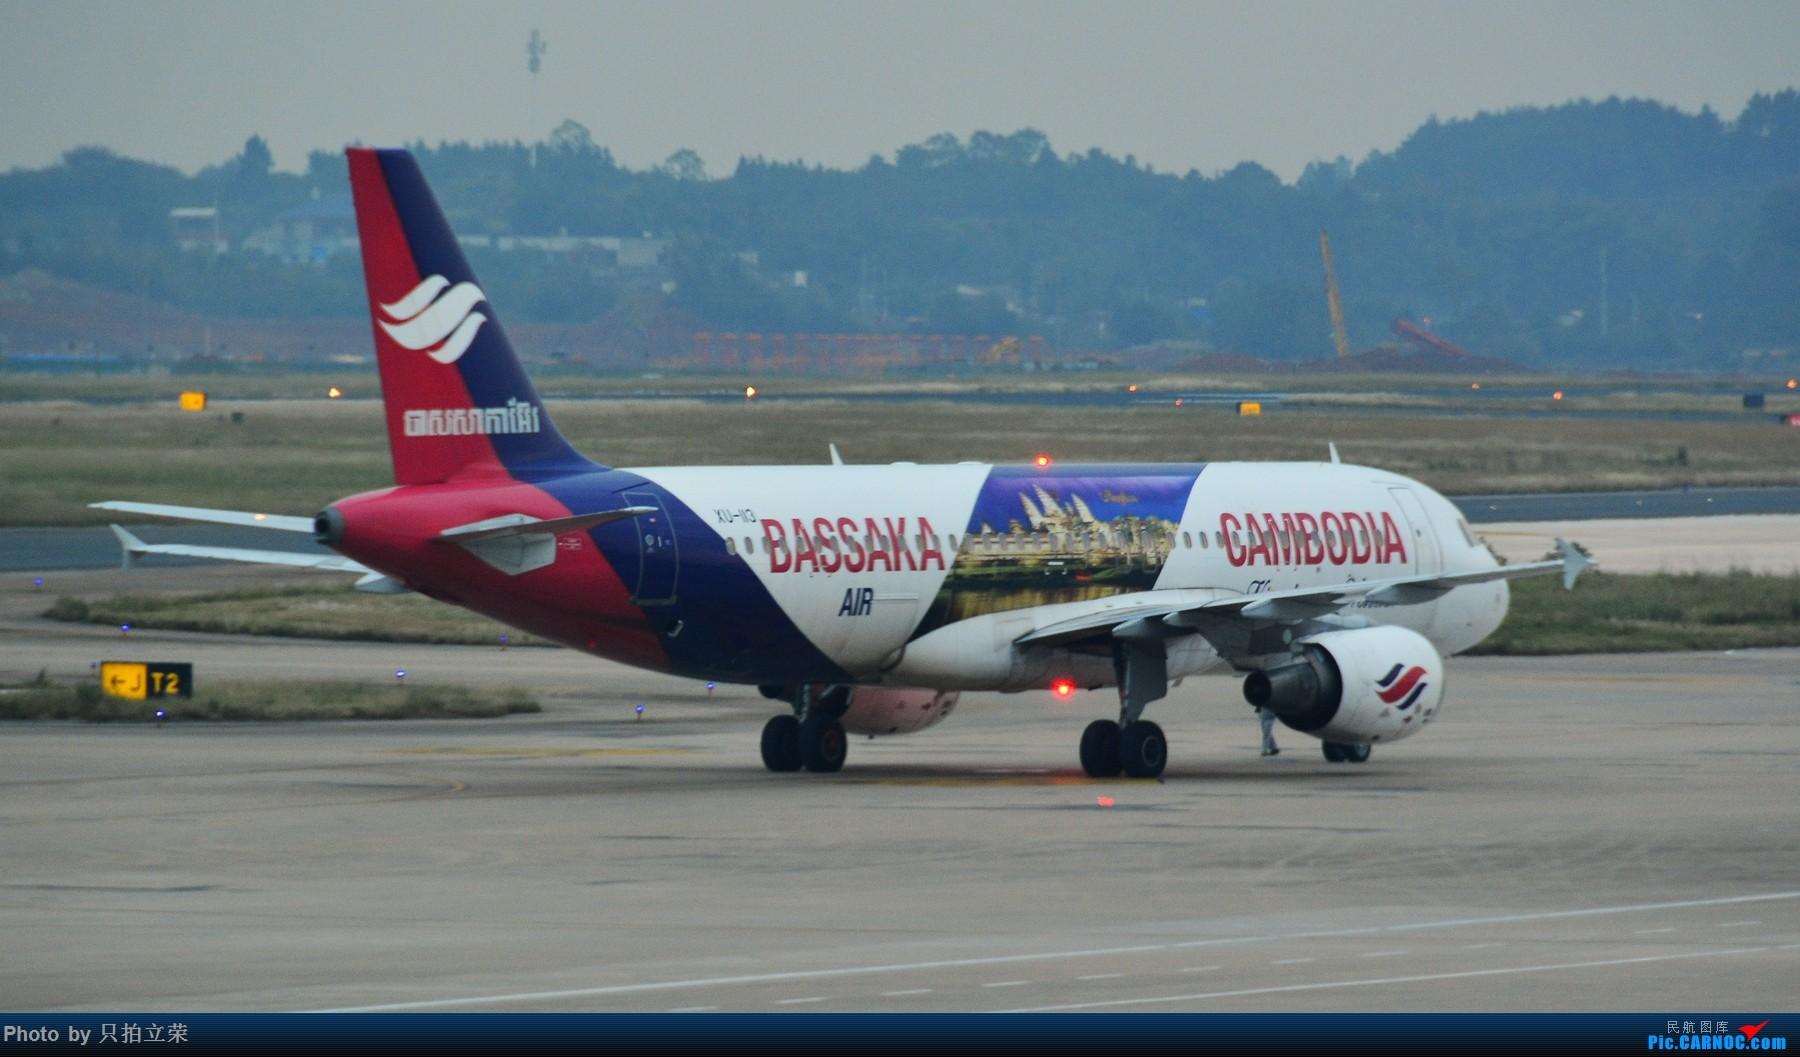 Re:[原创]湖南飞友会之10月9日长沙黄花好货满天飞! AIRBUS A320 XU-113 中国长沙黄花国际机场